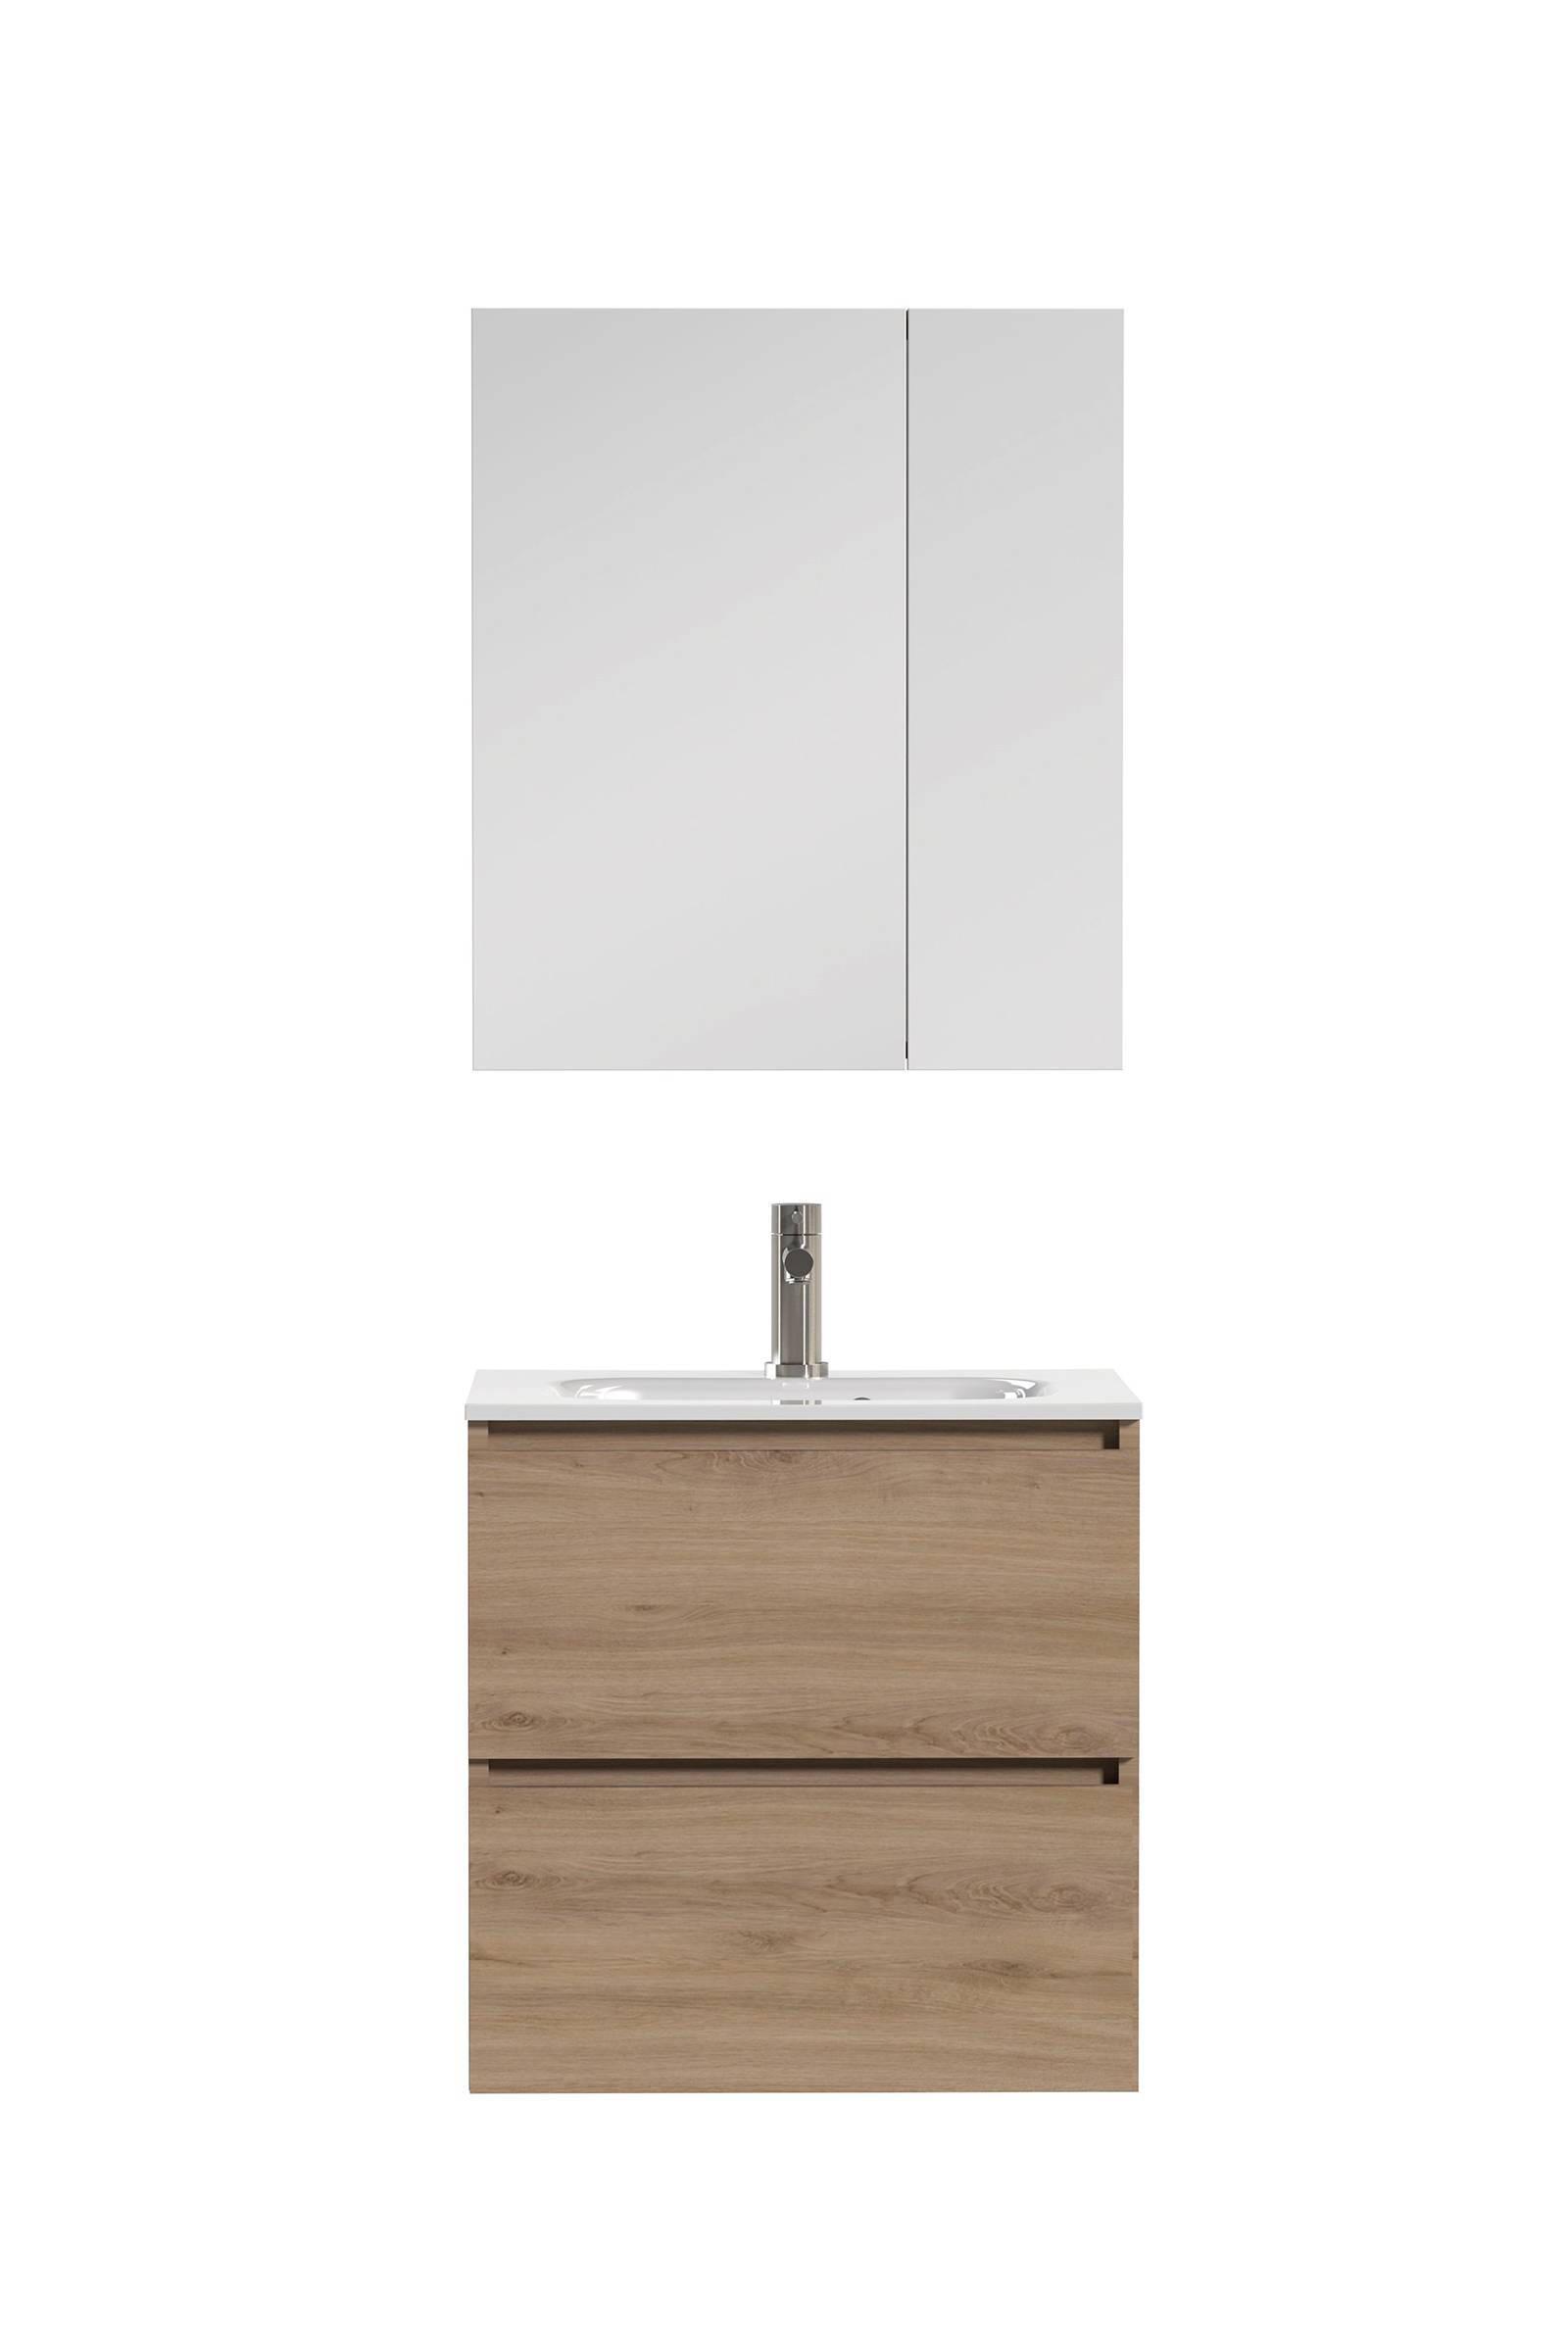 Tiger Loft Badkamermeubel 80cm met spiegelkast en witte wastafel ...